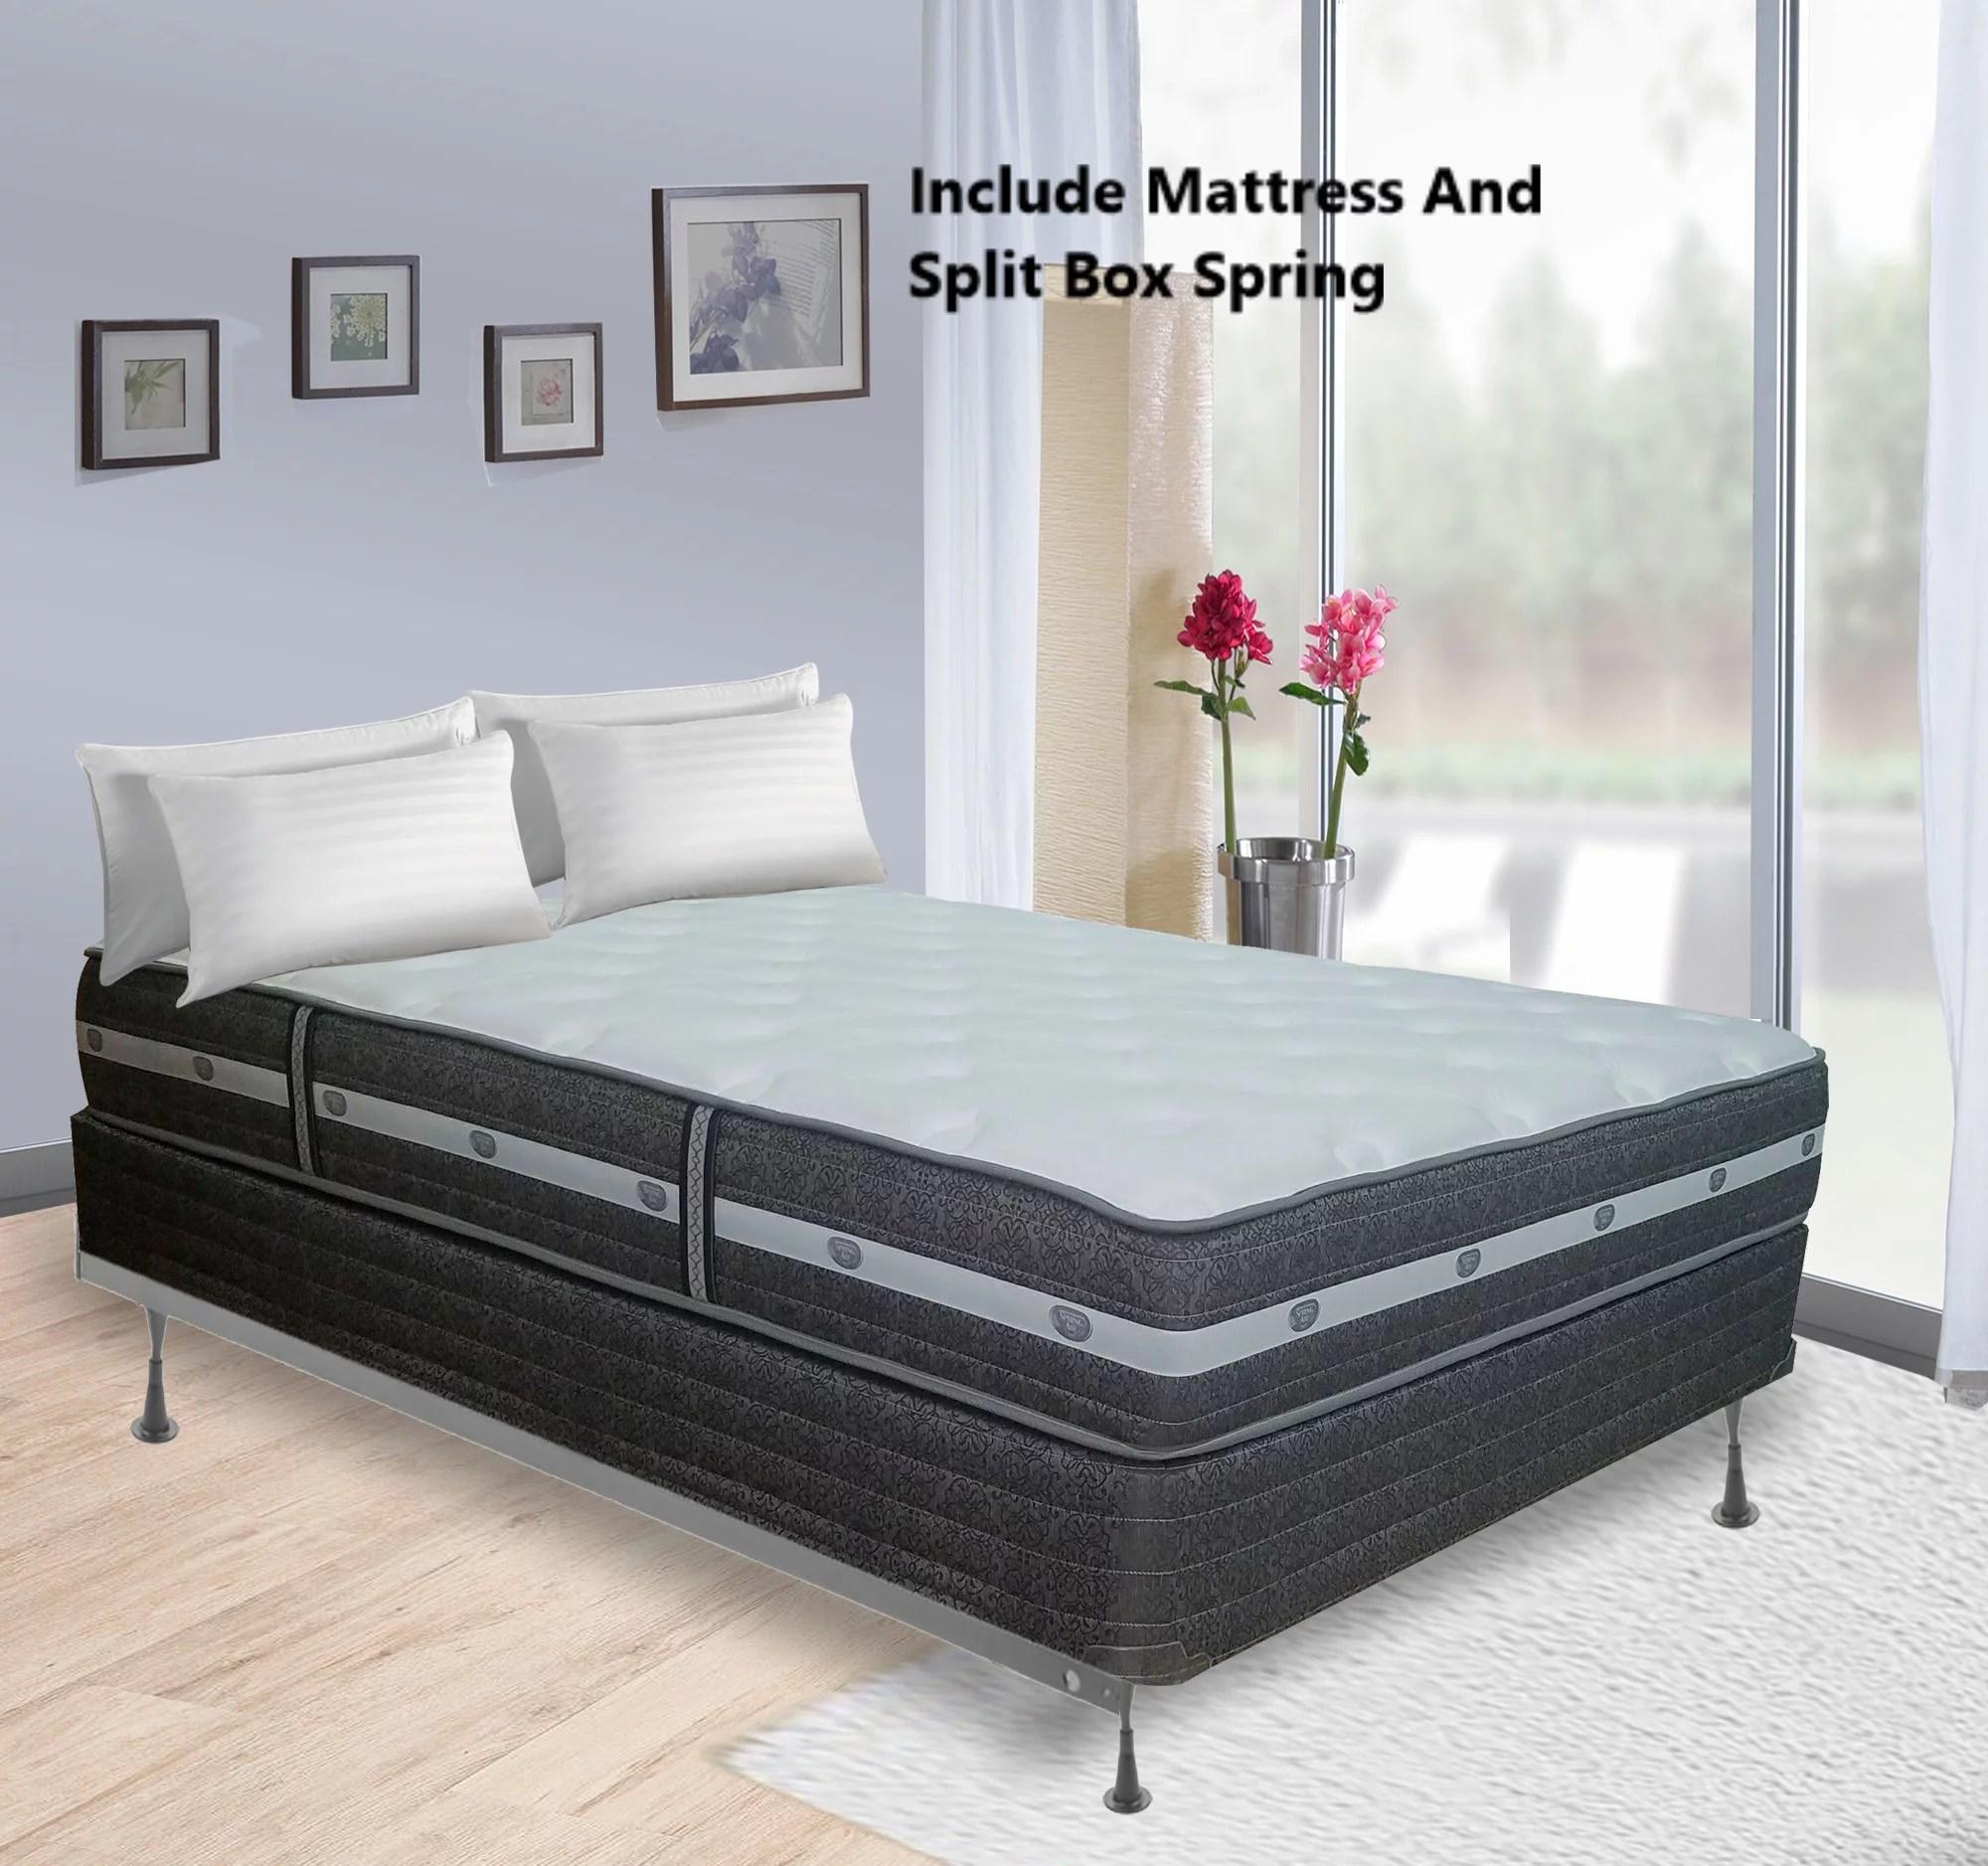 continental sleep 11 inch fully assembled innerspring mattress and 8 split box spring full size walmart com